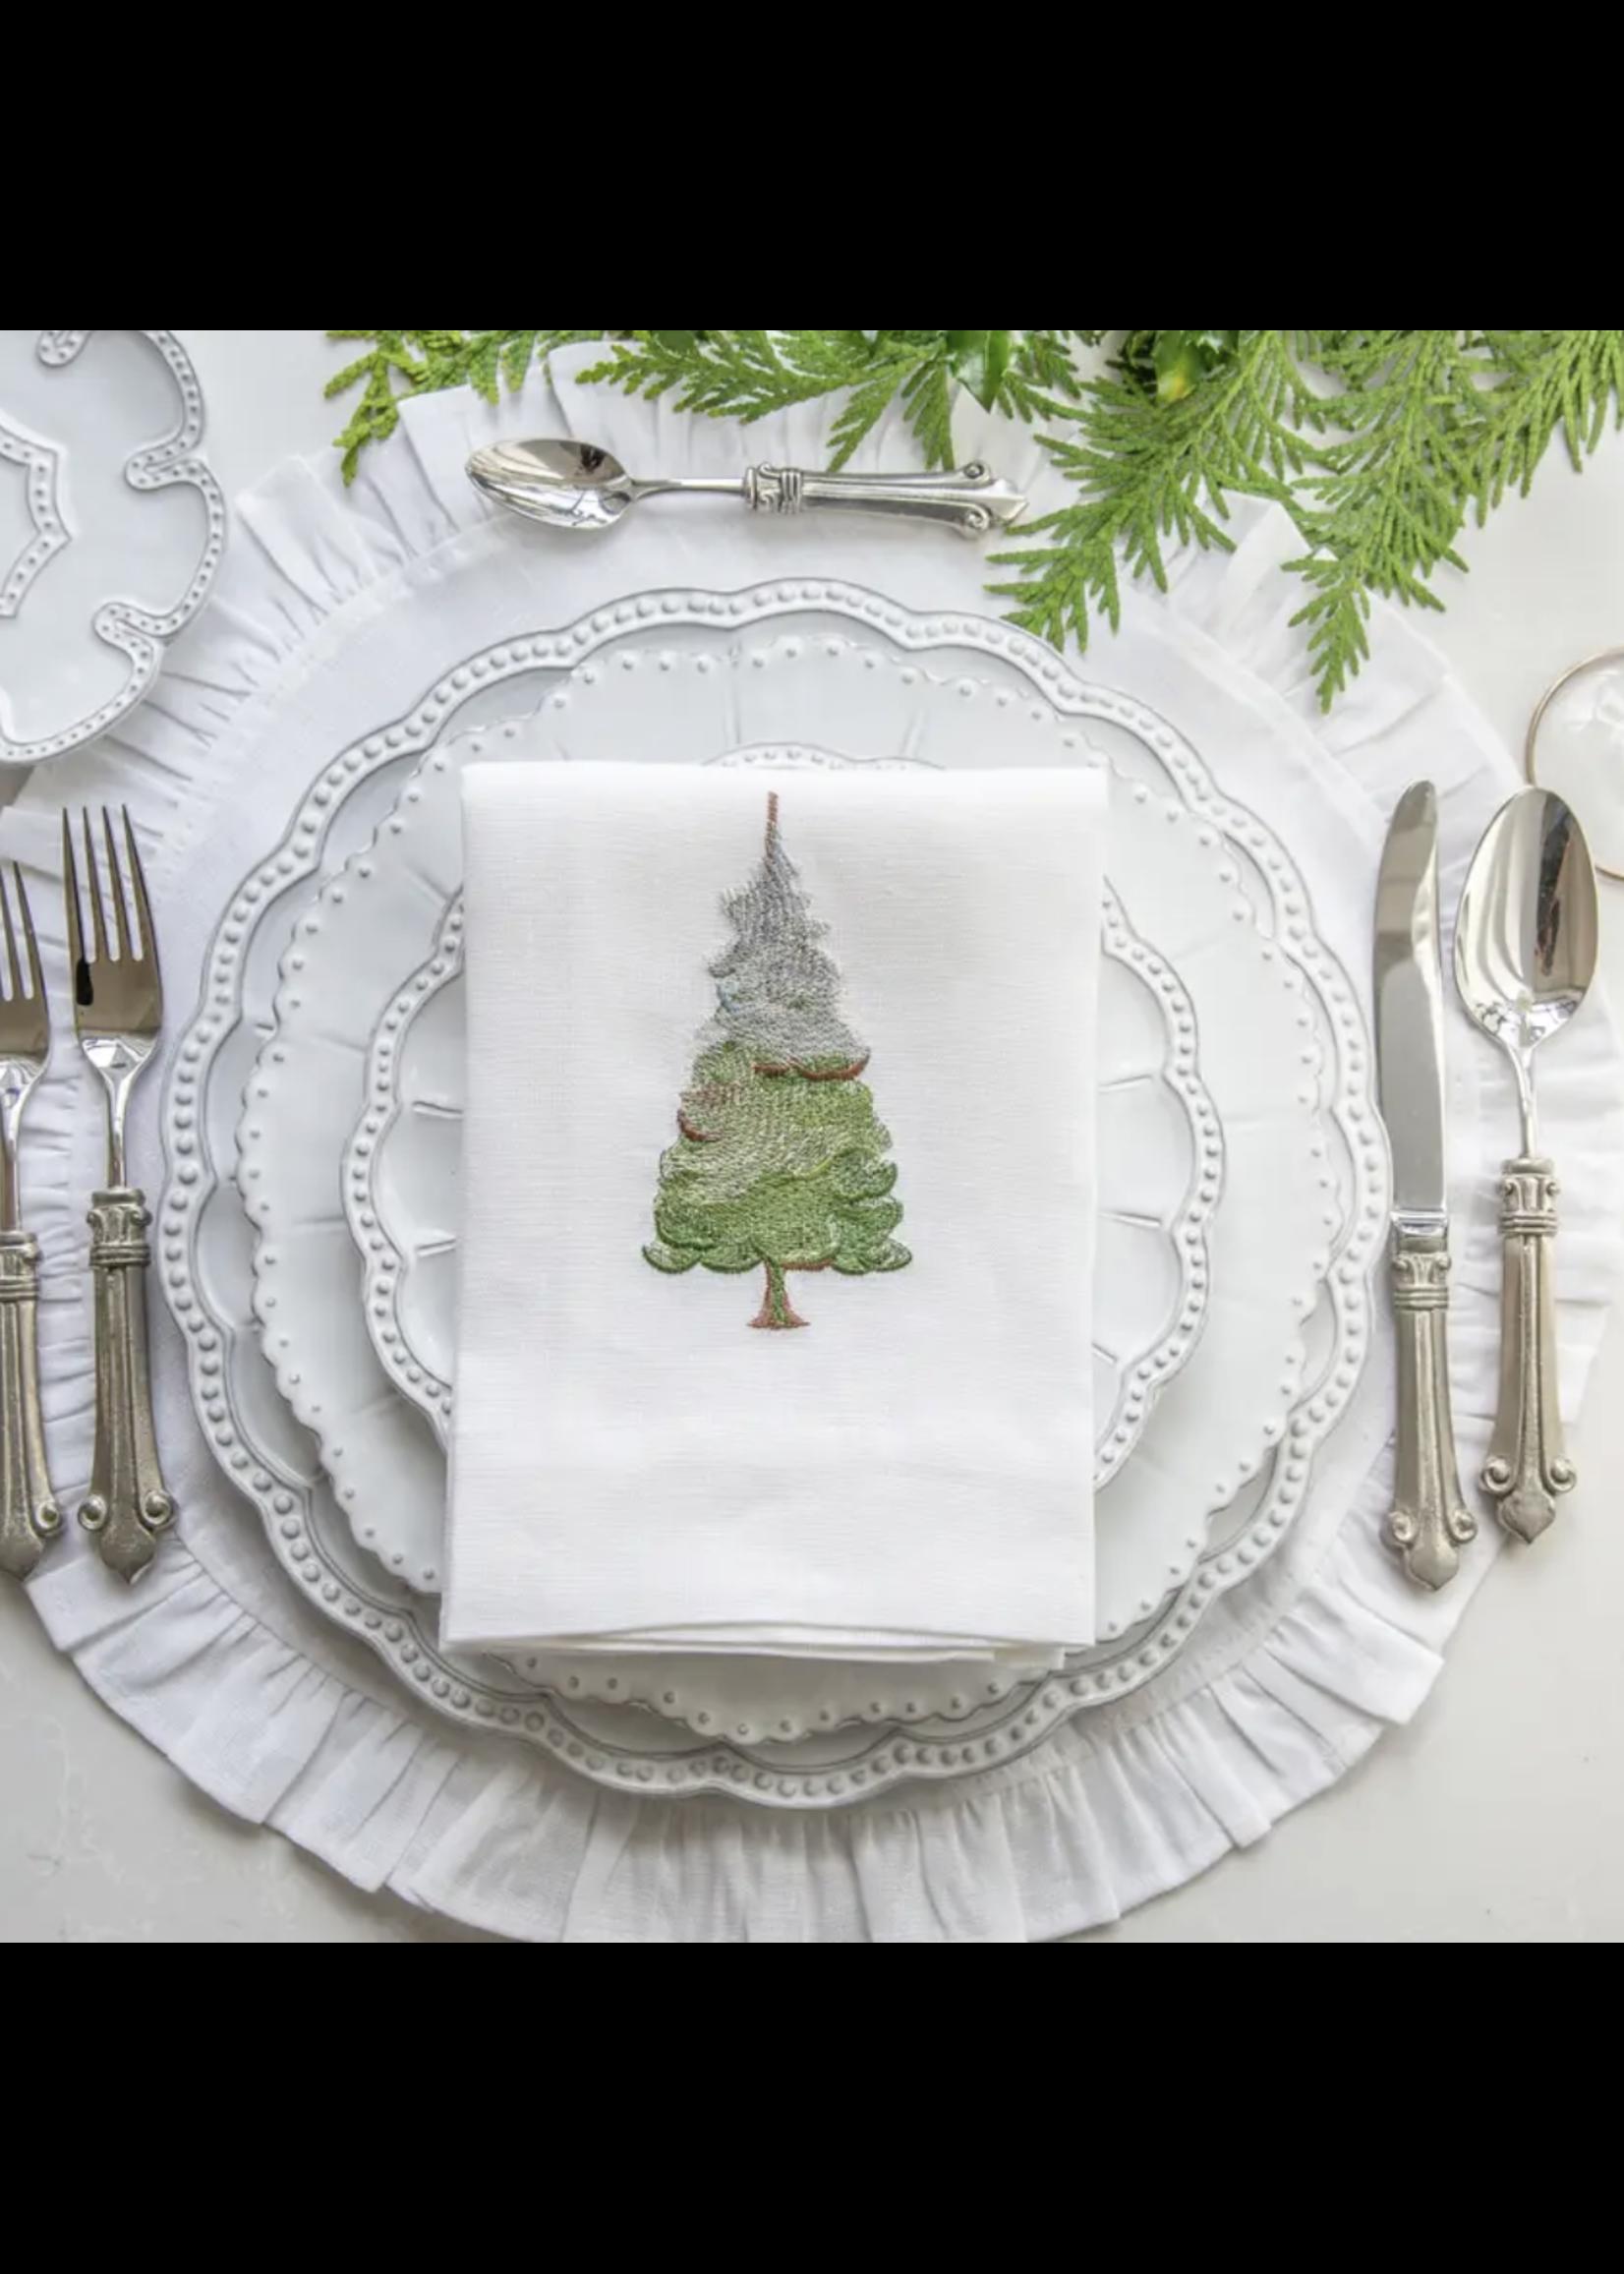 Crown Linen Towel - Snowy Pine